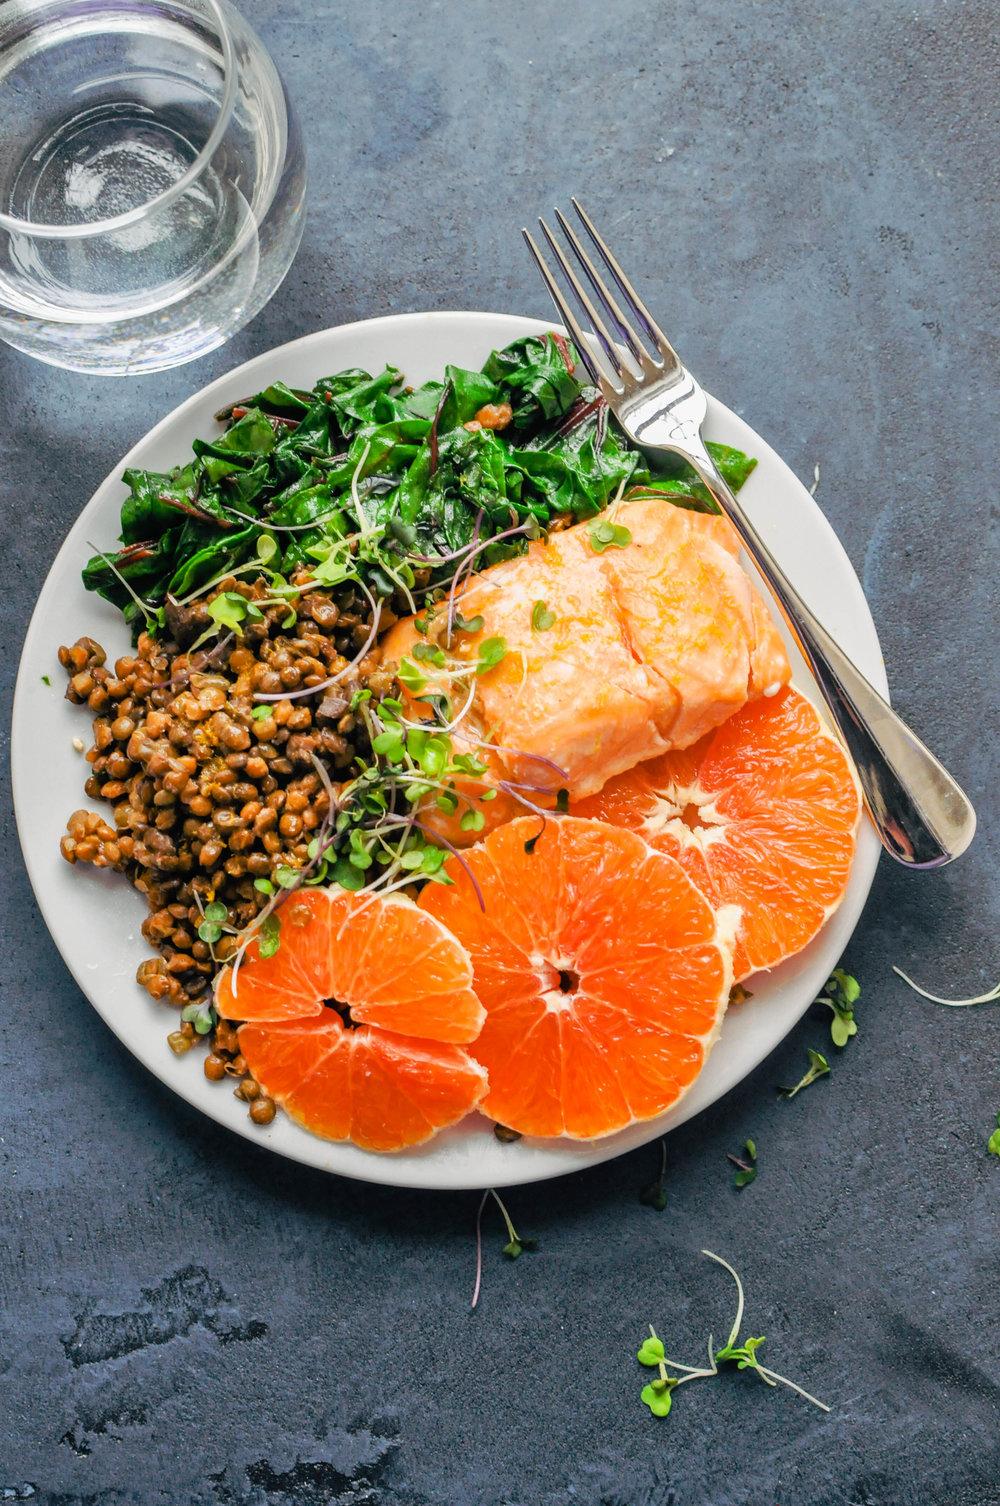 Cara Cara Orange Salmon & Lentil Bowl - This delicious Cara Cara orange salmon and lentil bowl is an awesome, healthy weeknight meal!